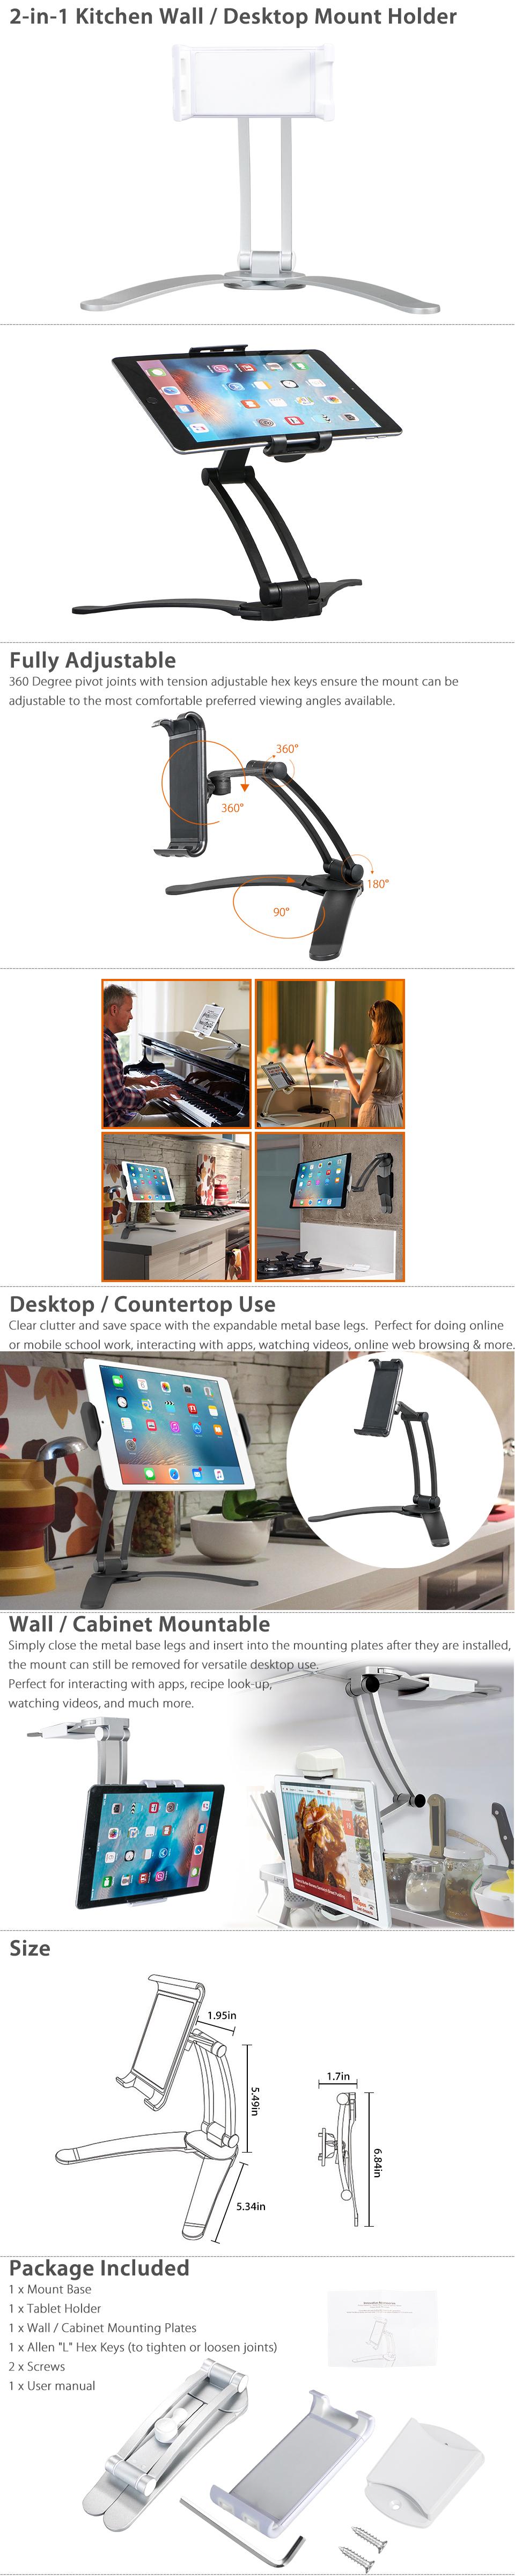 Kitchen Wall/Desktop Recipe Mount Stand Holder for 3-10inch Tablet ...